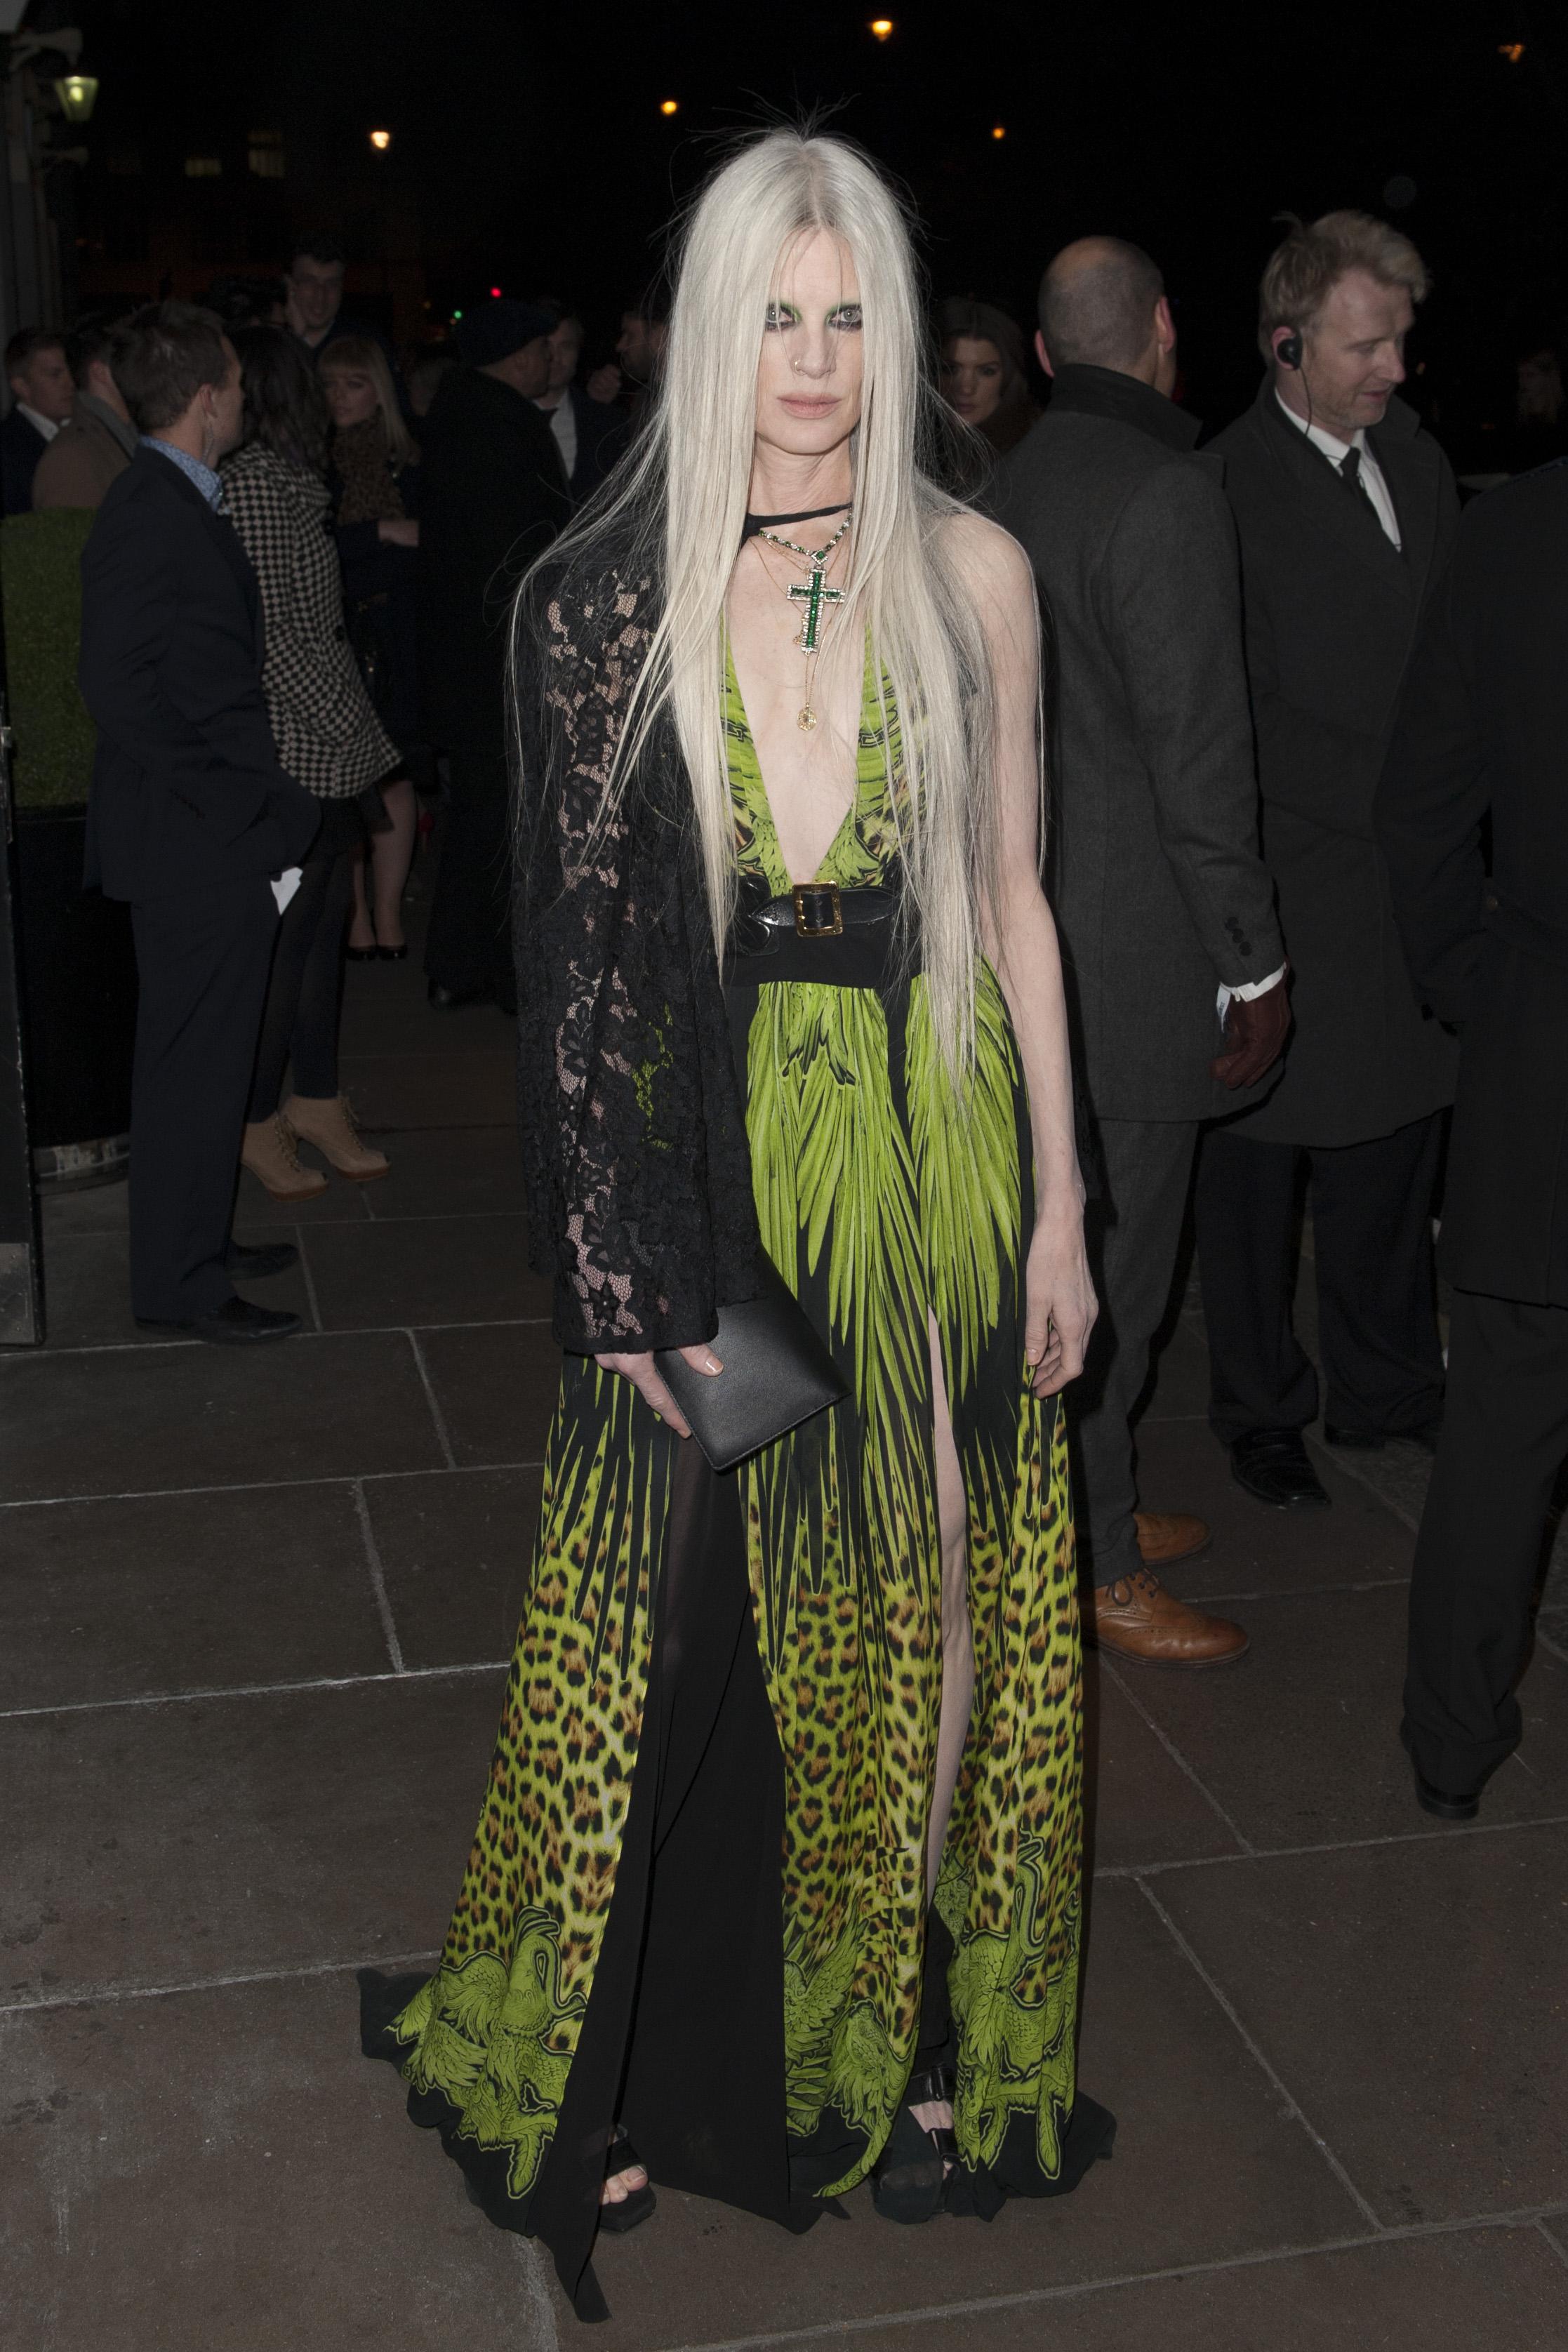 Kristen McMenamy at the Brit Awards in London